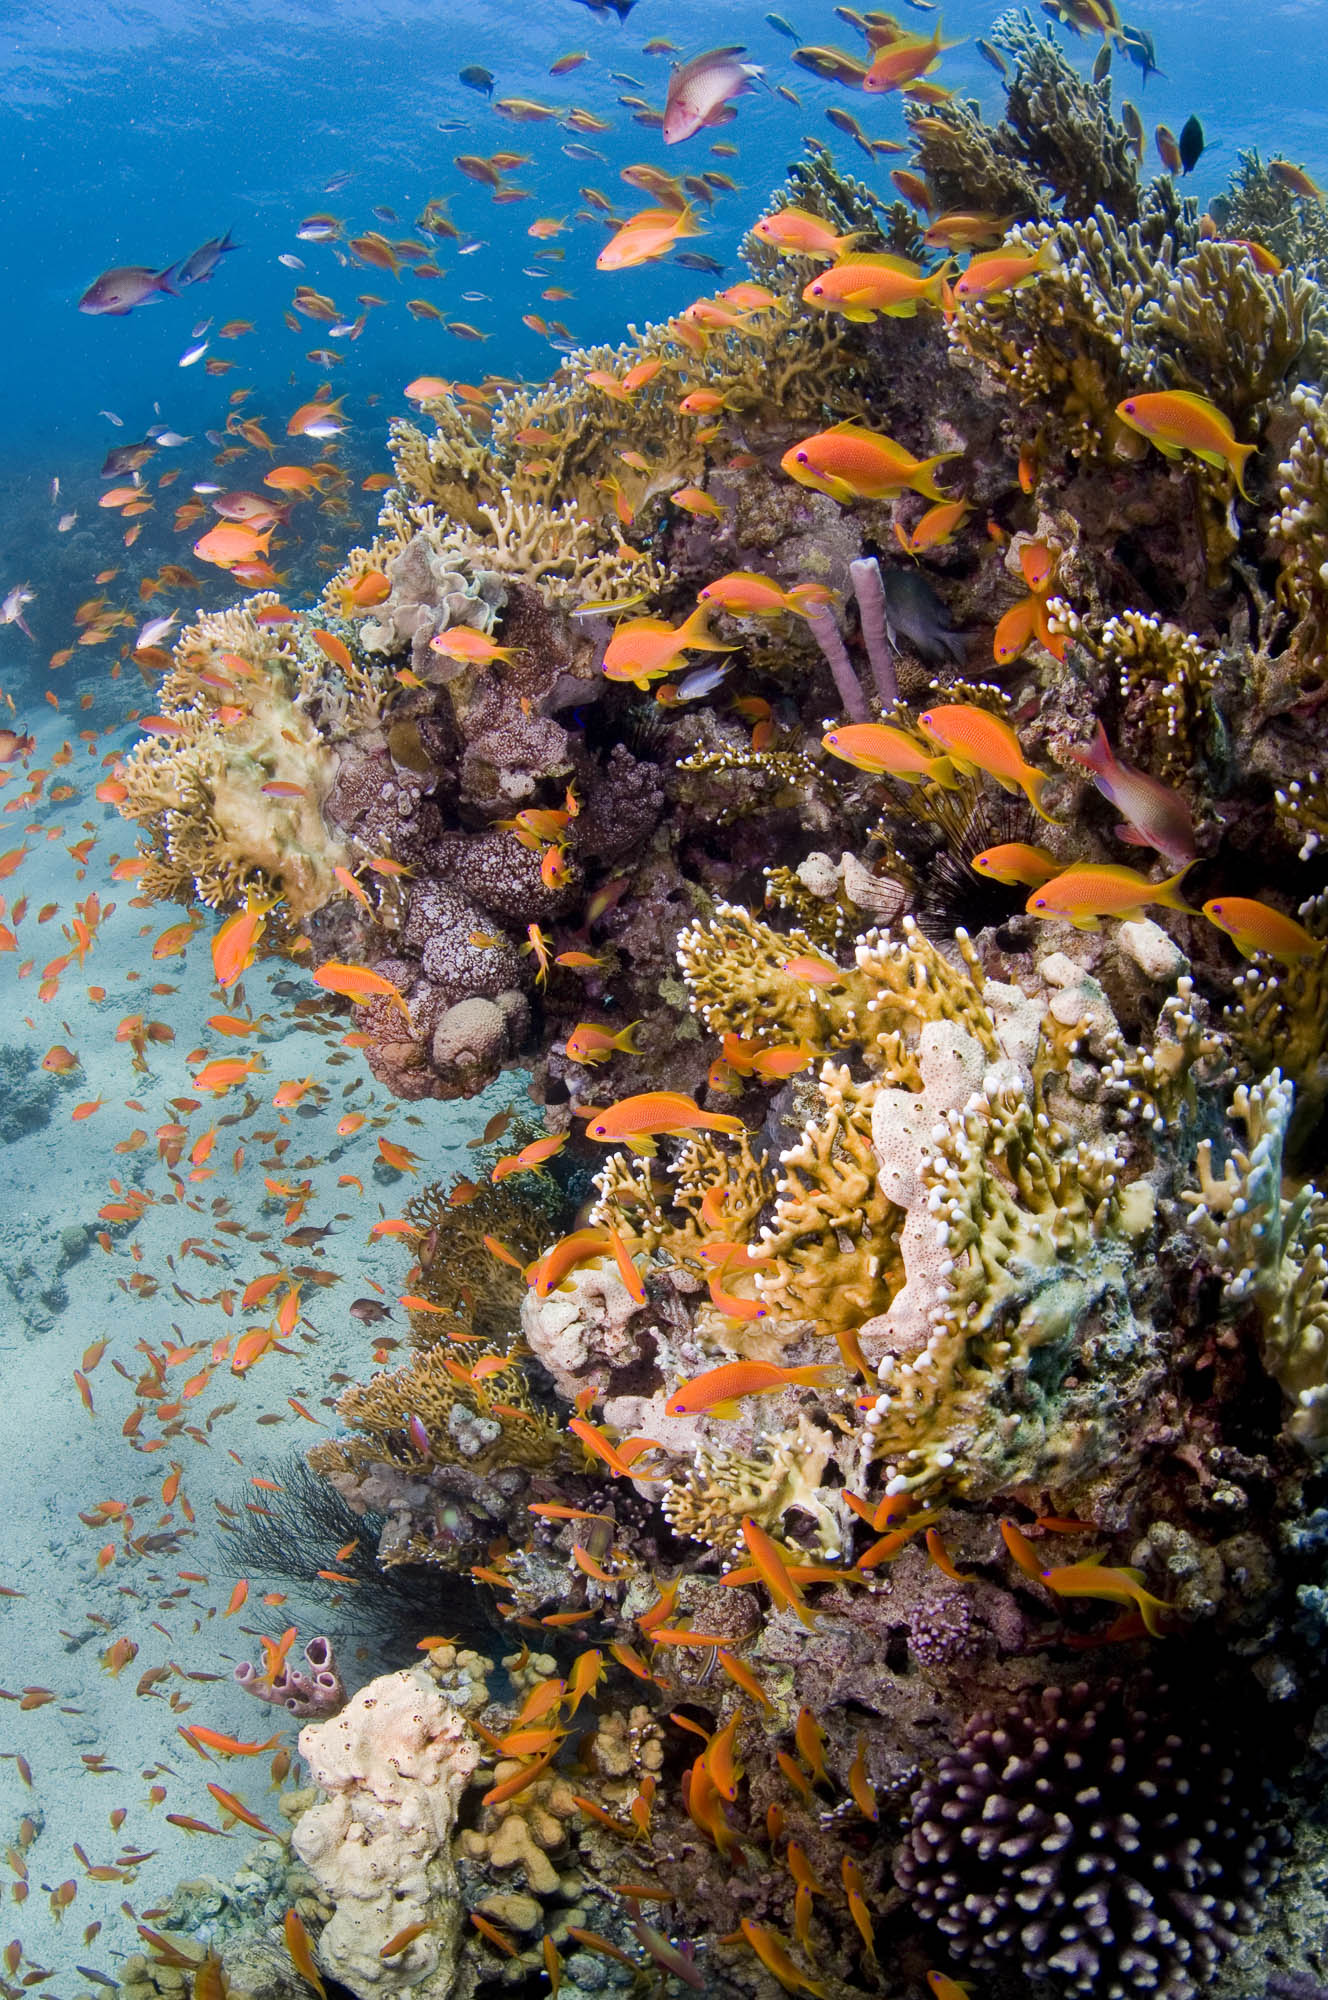 AQABA, JORDAN CREDIT: WARREN BAVERSTOCK / coral reef image bank